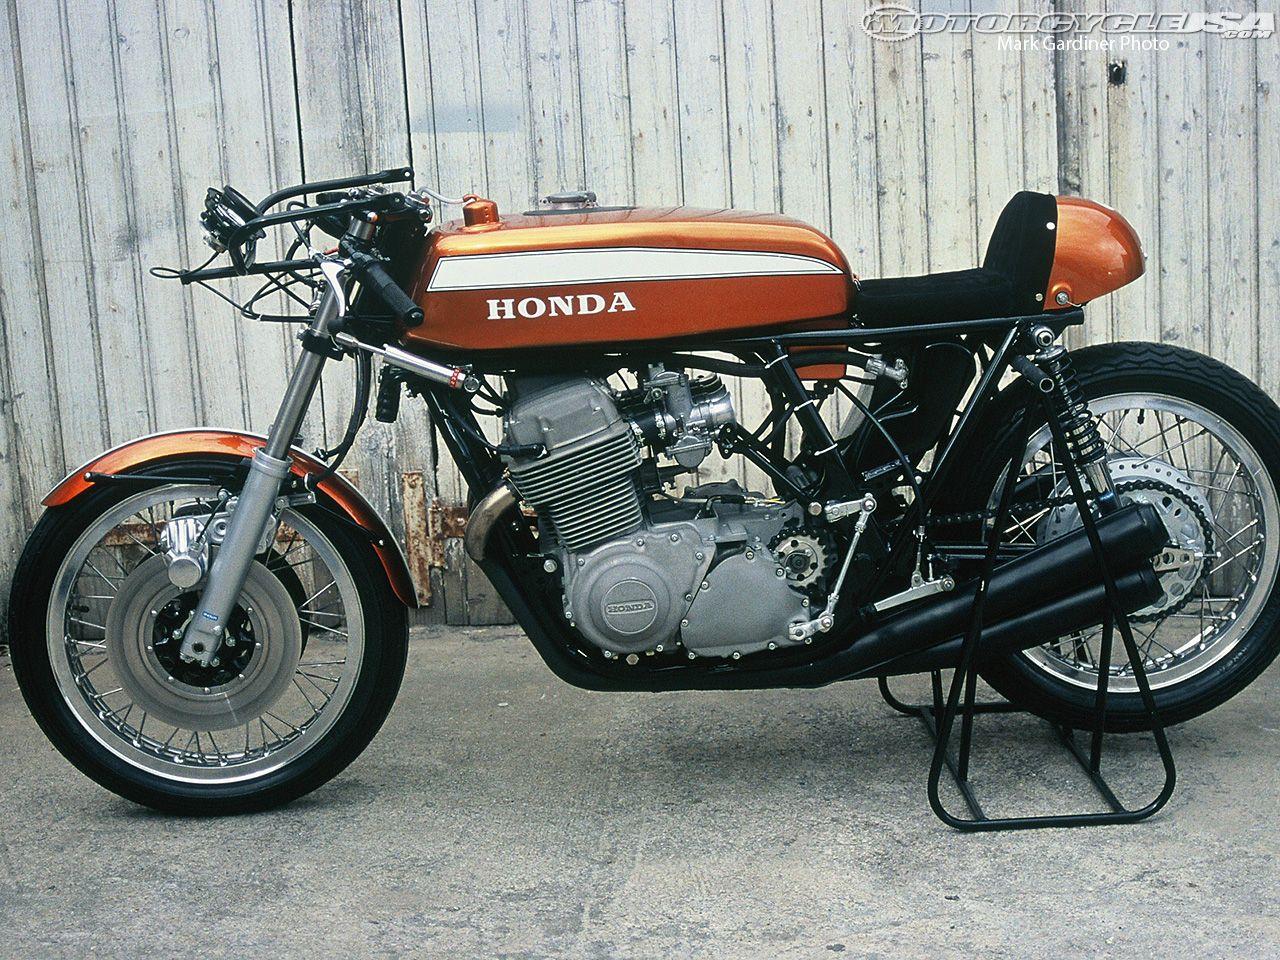 Dick Mann S 1970 Daytona 200 Honda Cb750 Racing Type Sport